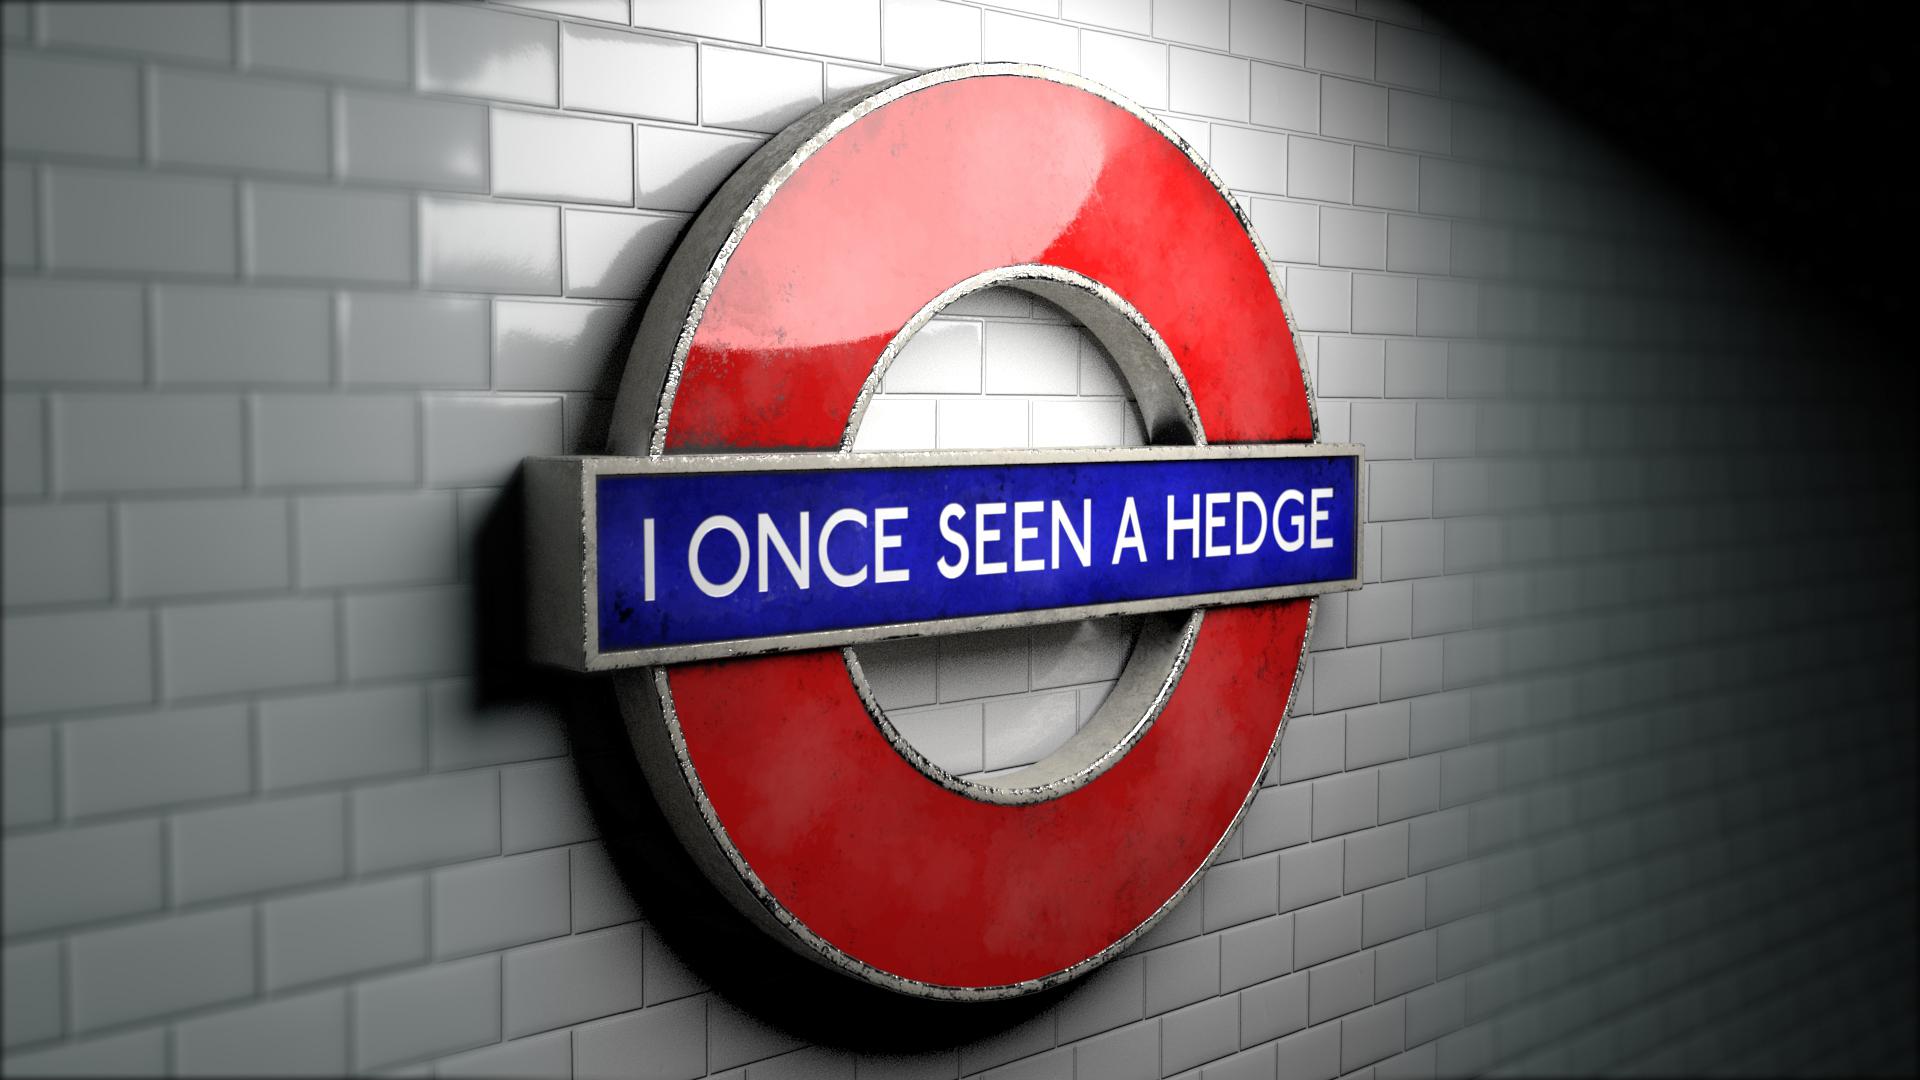 https://i.ibb.co/1RWzgC2/Underground-Hedge-Comp.jpg